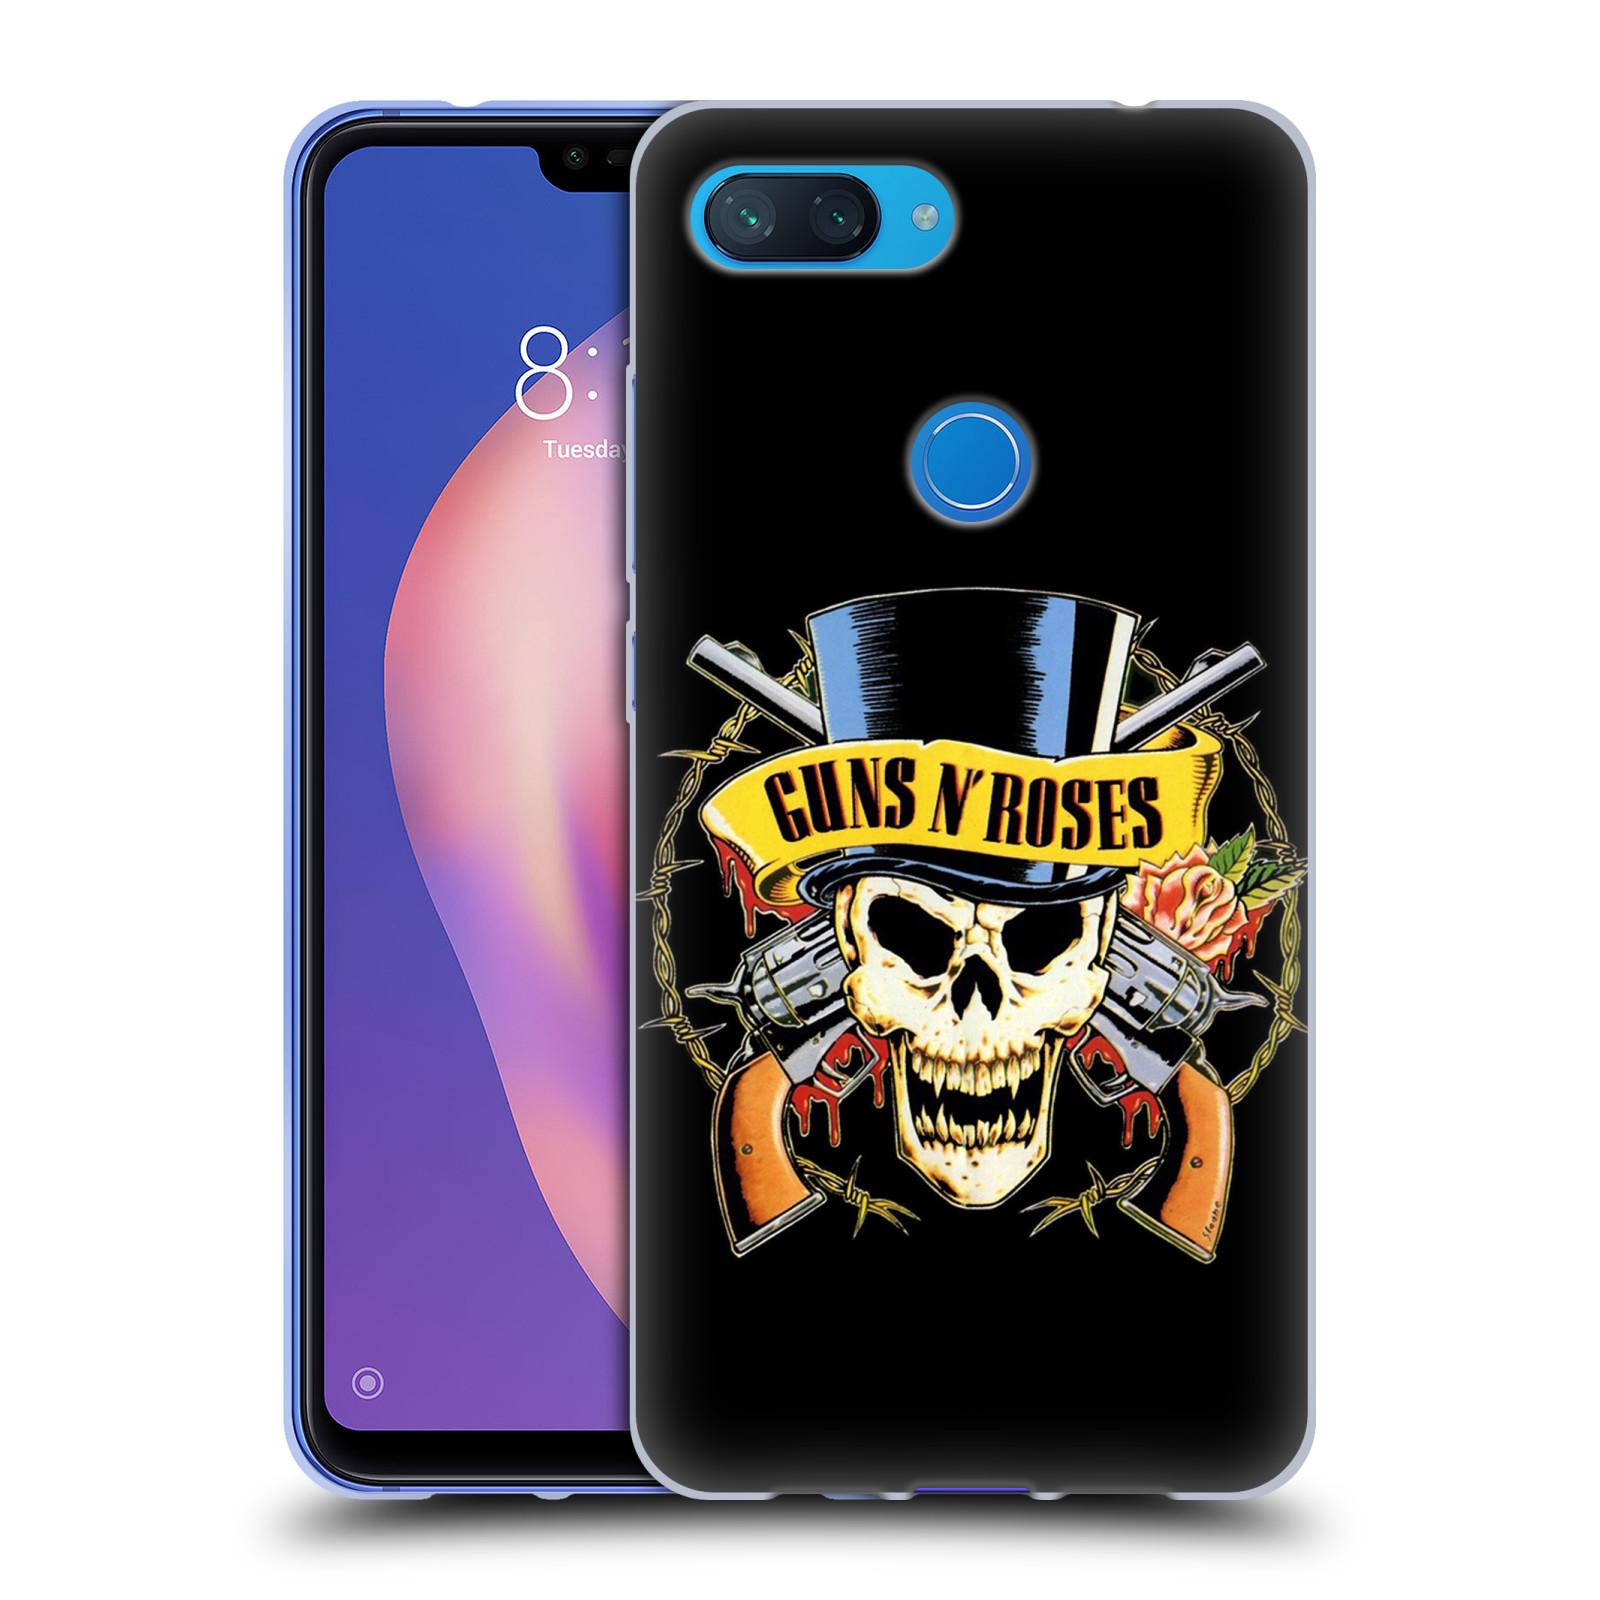 Silikonové pouzdro na mobil Xiaomi Mi 8 Lite - Head Case - Guns N' Roses - Lebka